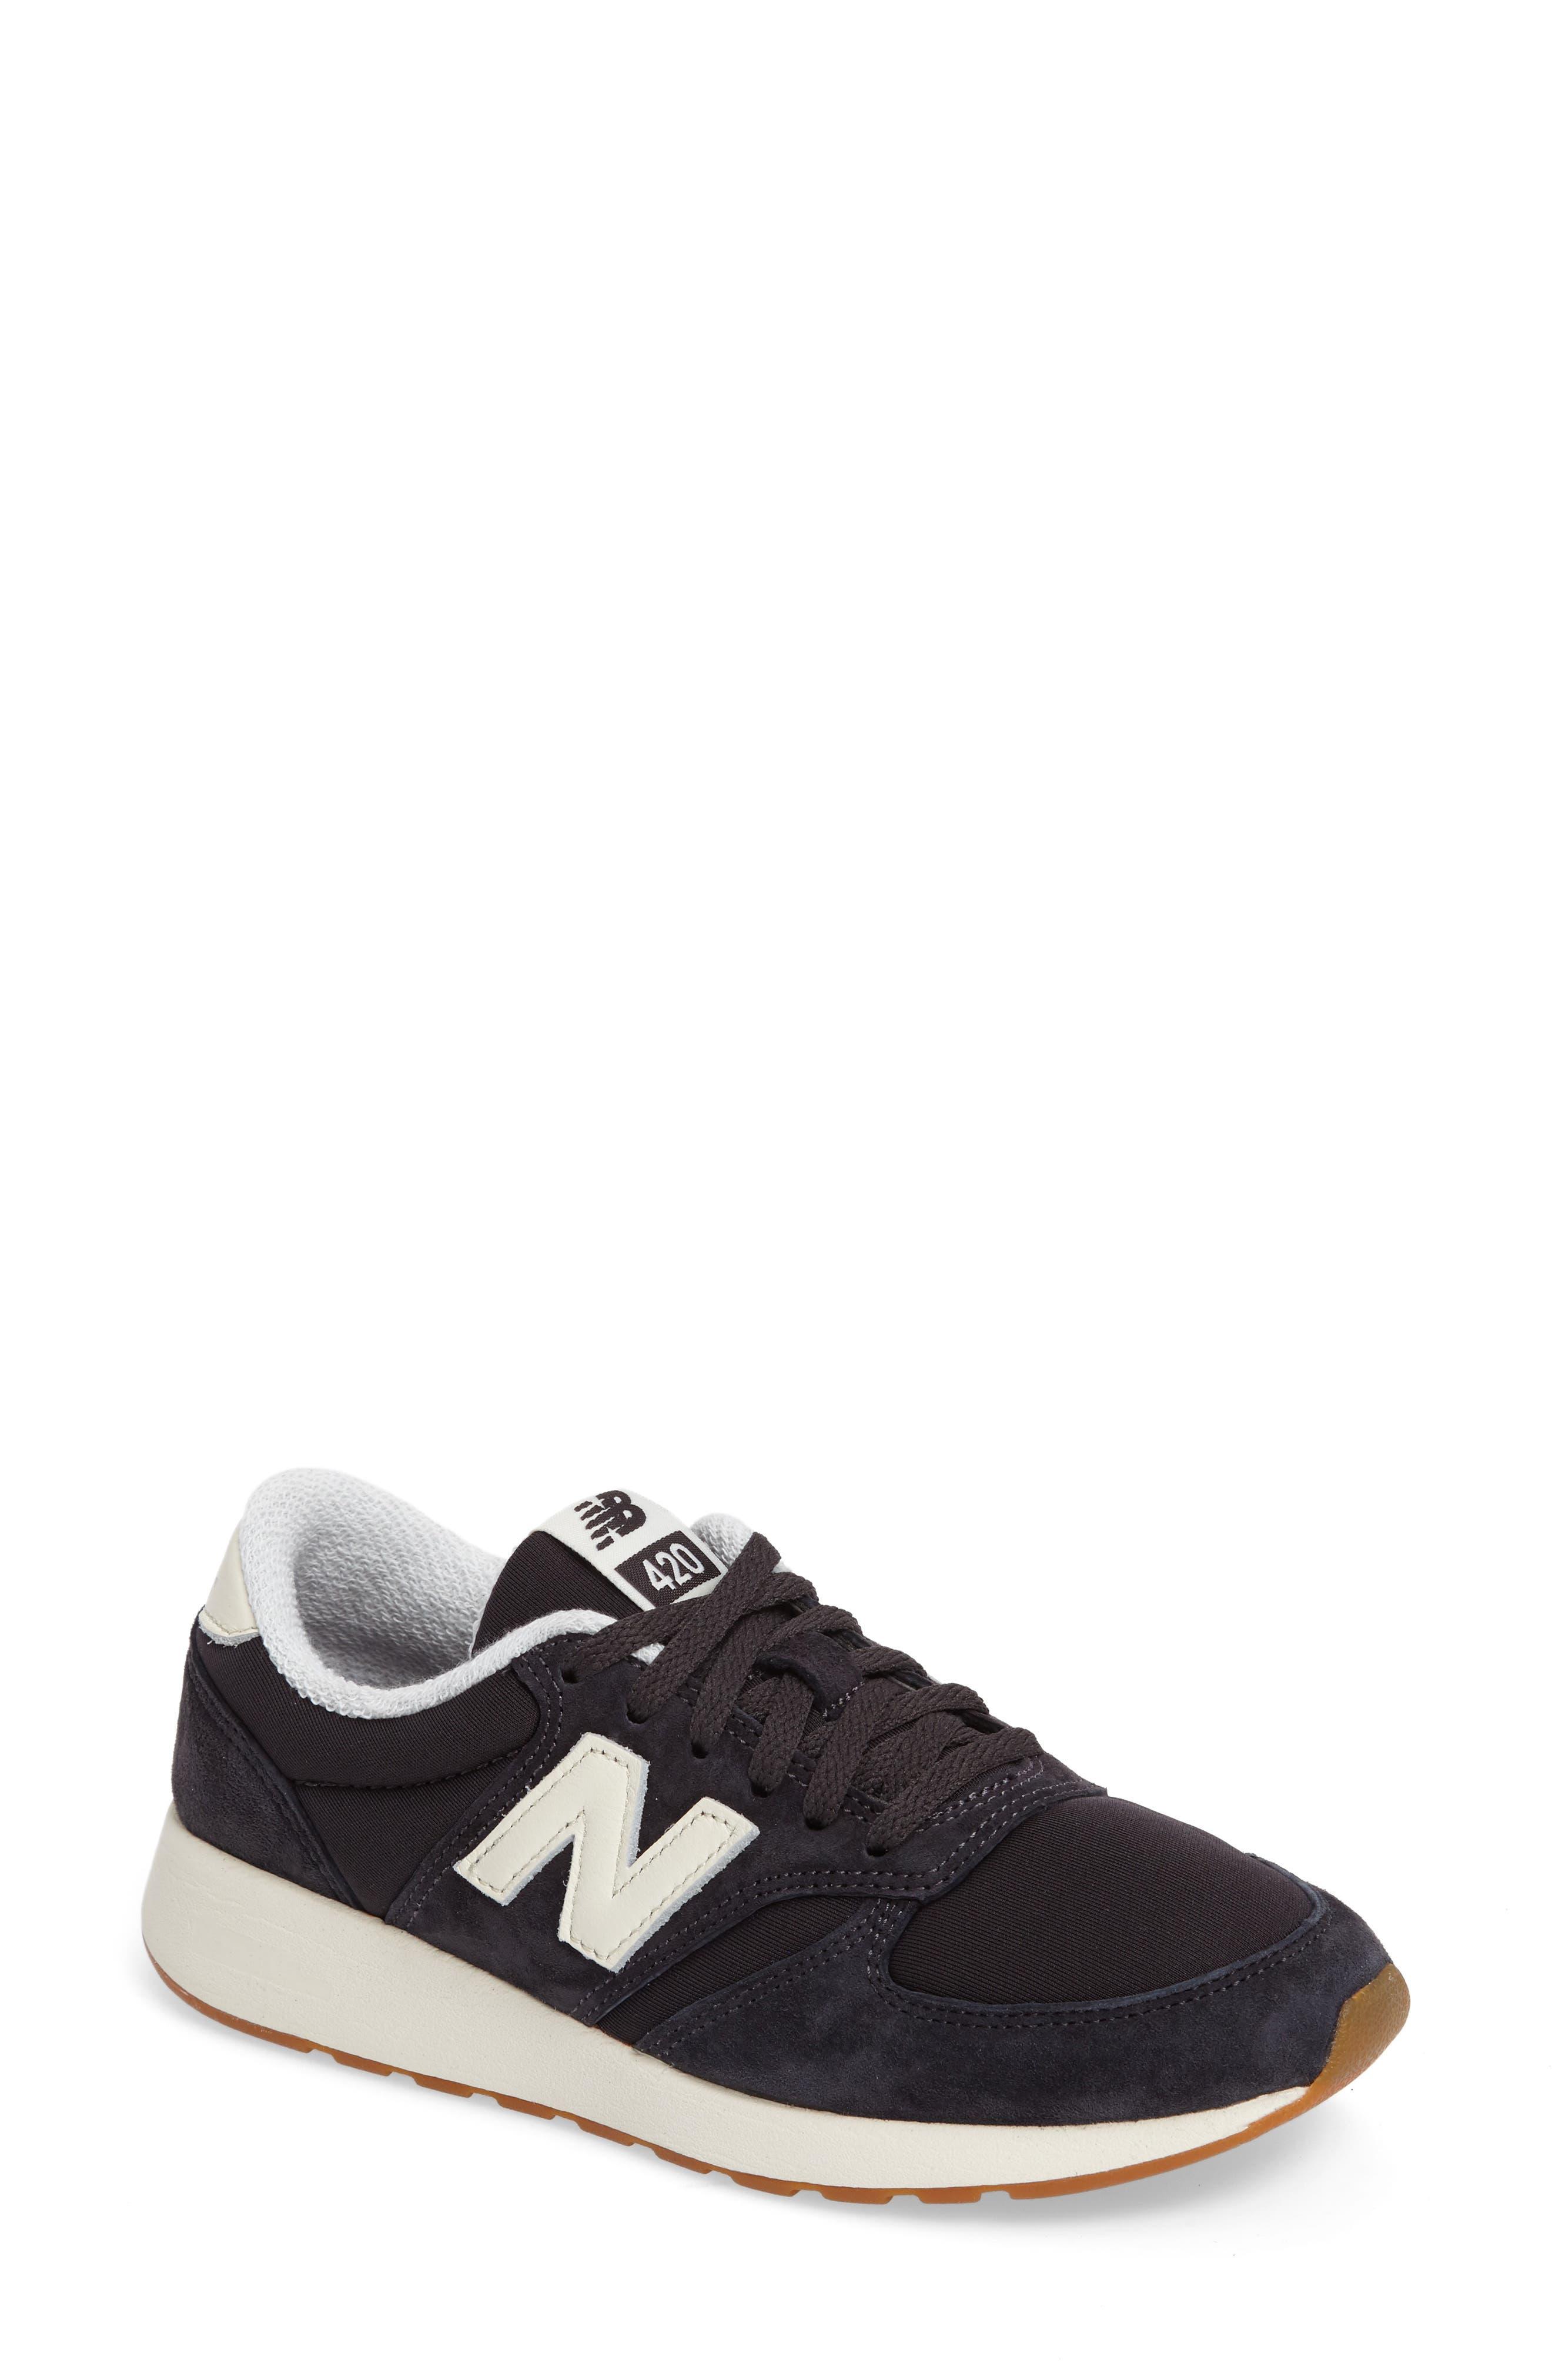 Main Image - New Balance 420 Sneaker (Women)